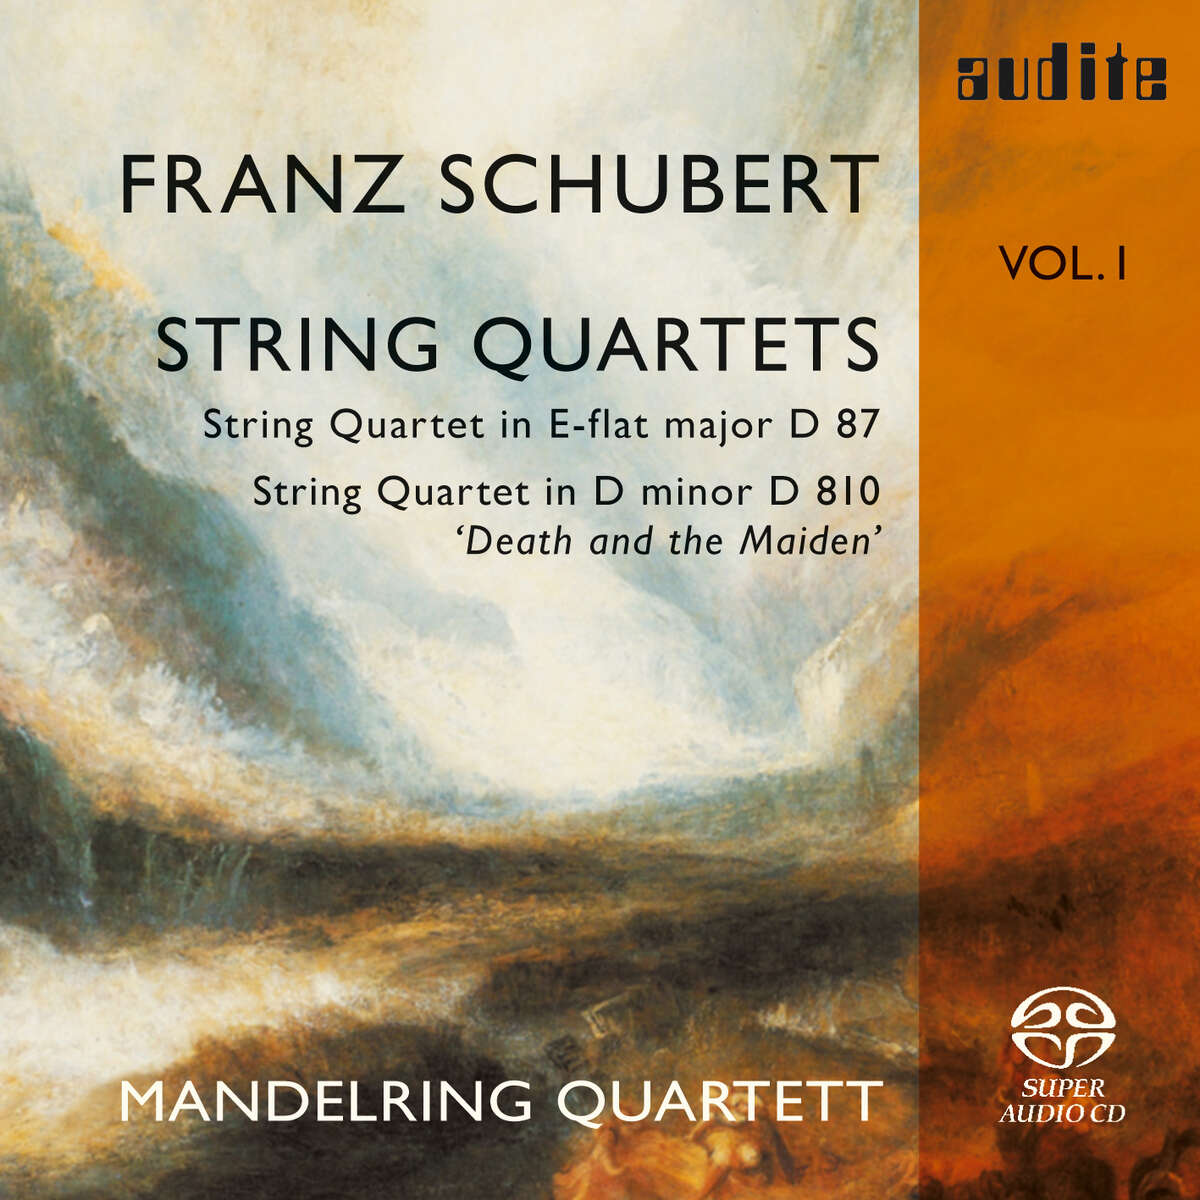 F. Schubert: String Quartets Vol. I